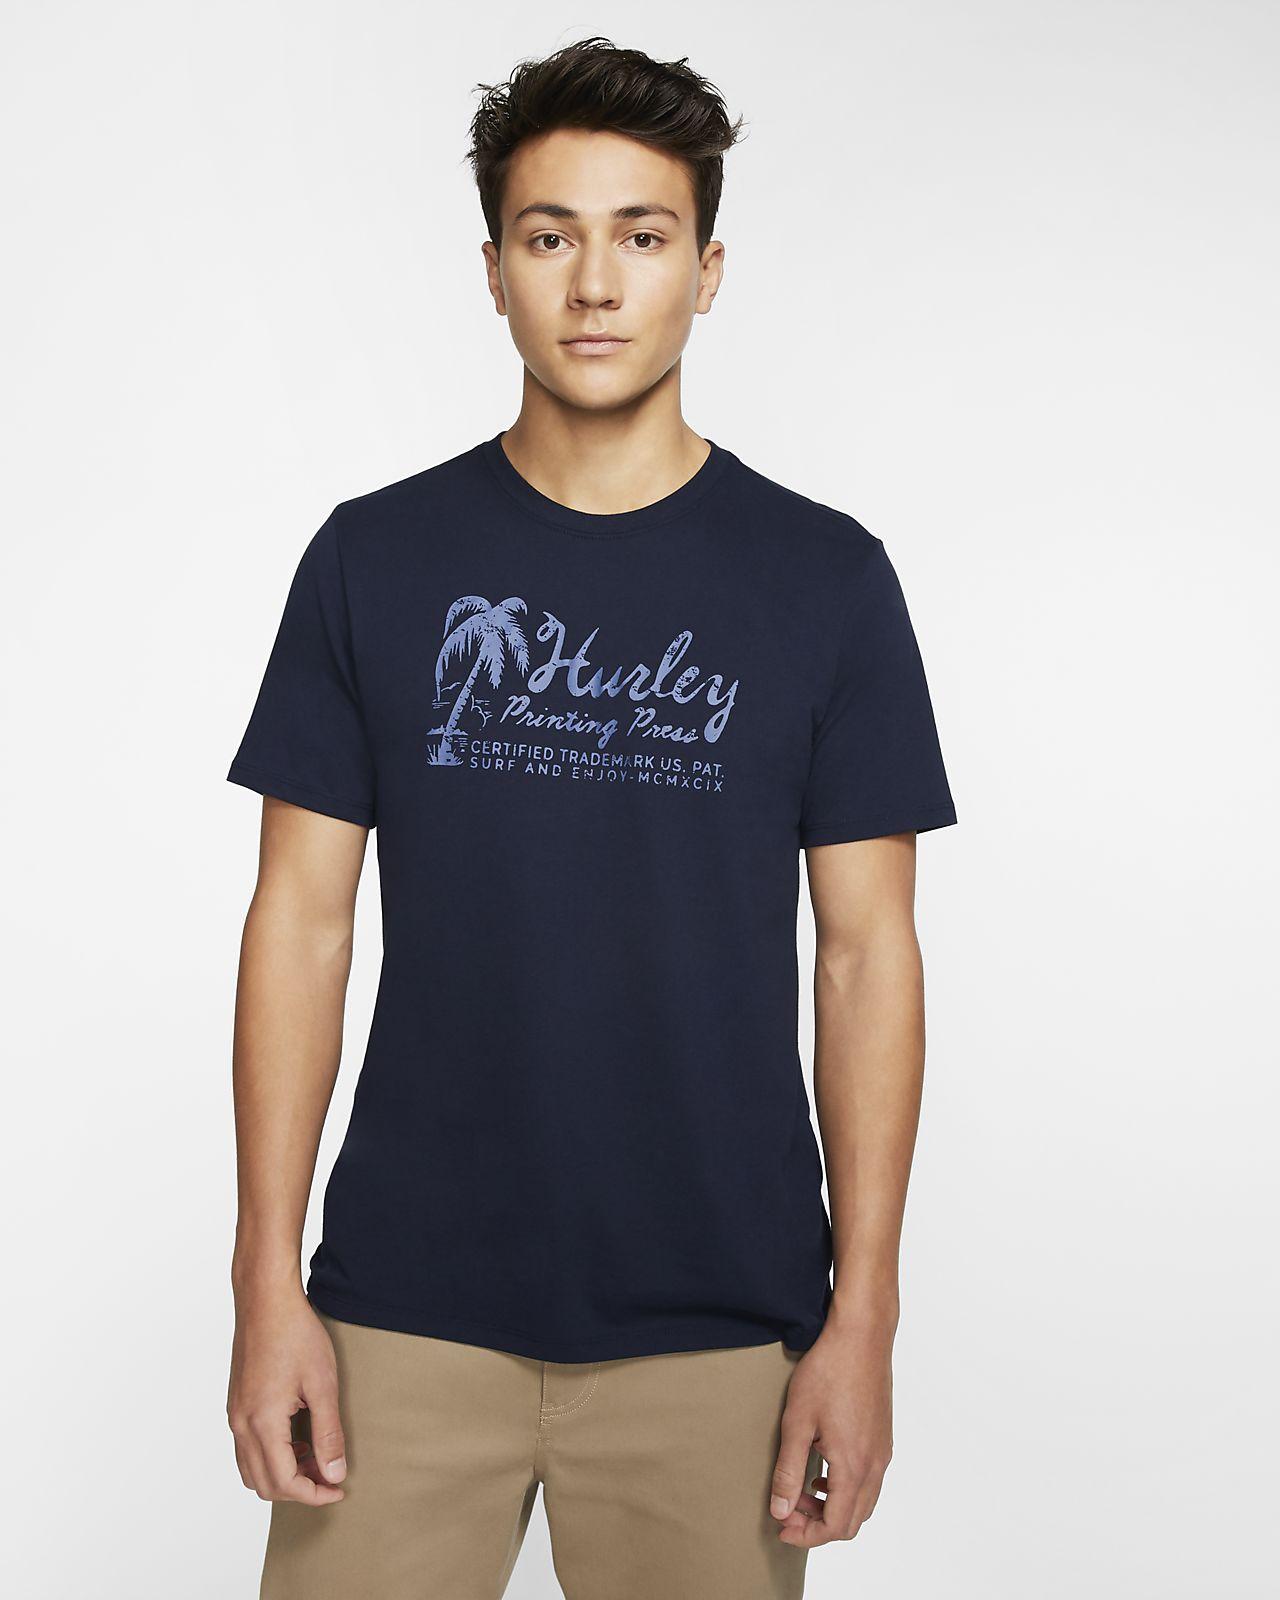 Hurley Dri-FIT Surf Imports Kaliteli Kesim Erkek Tişörtü